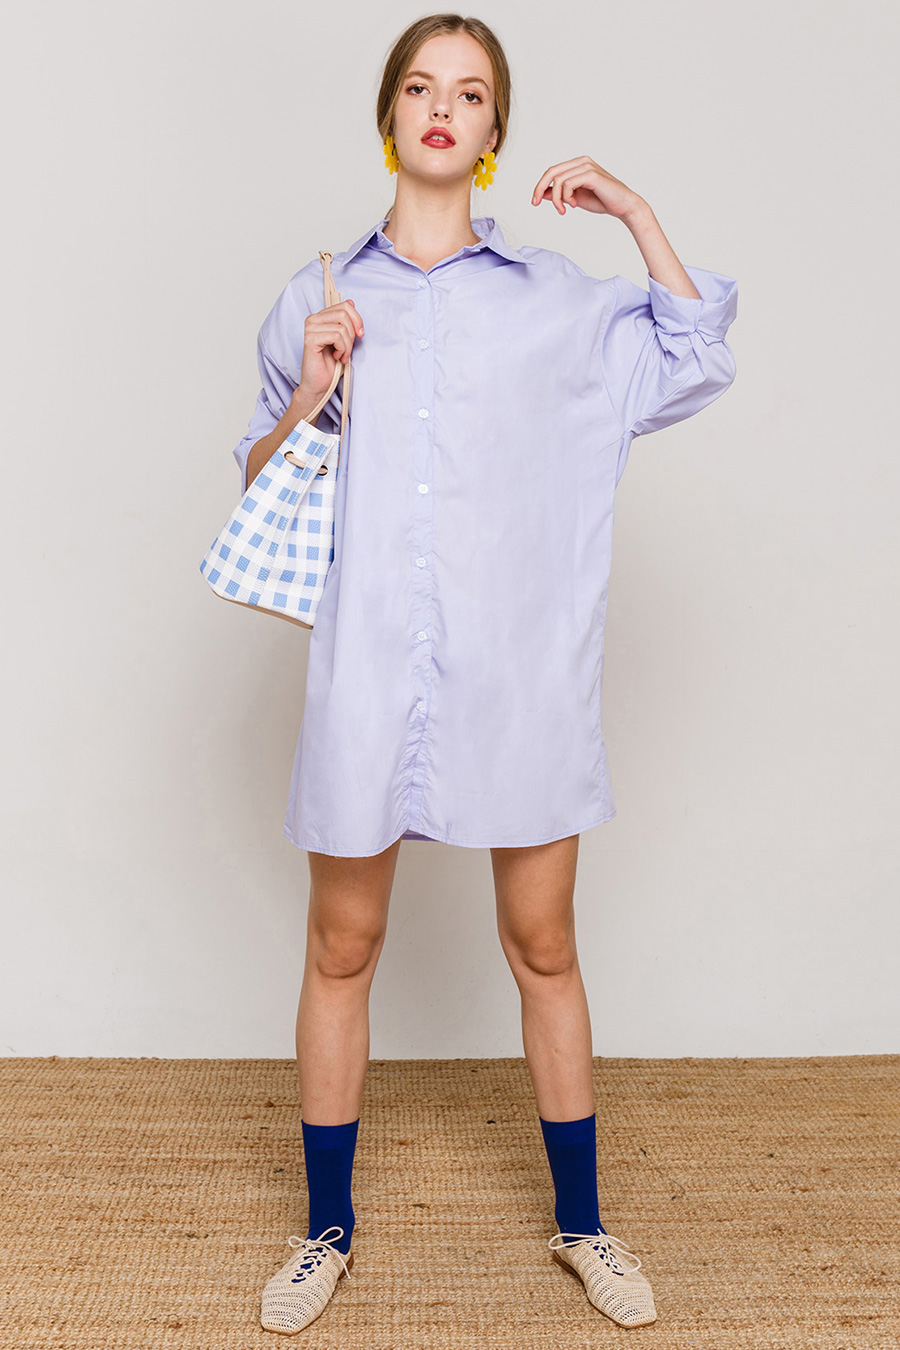 DELPHI DRESS - PERIWINKLE